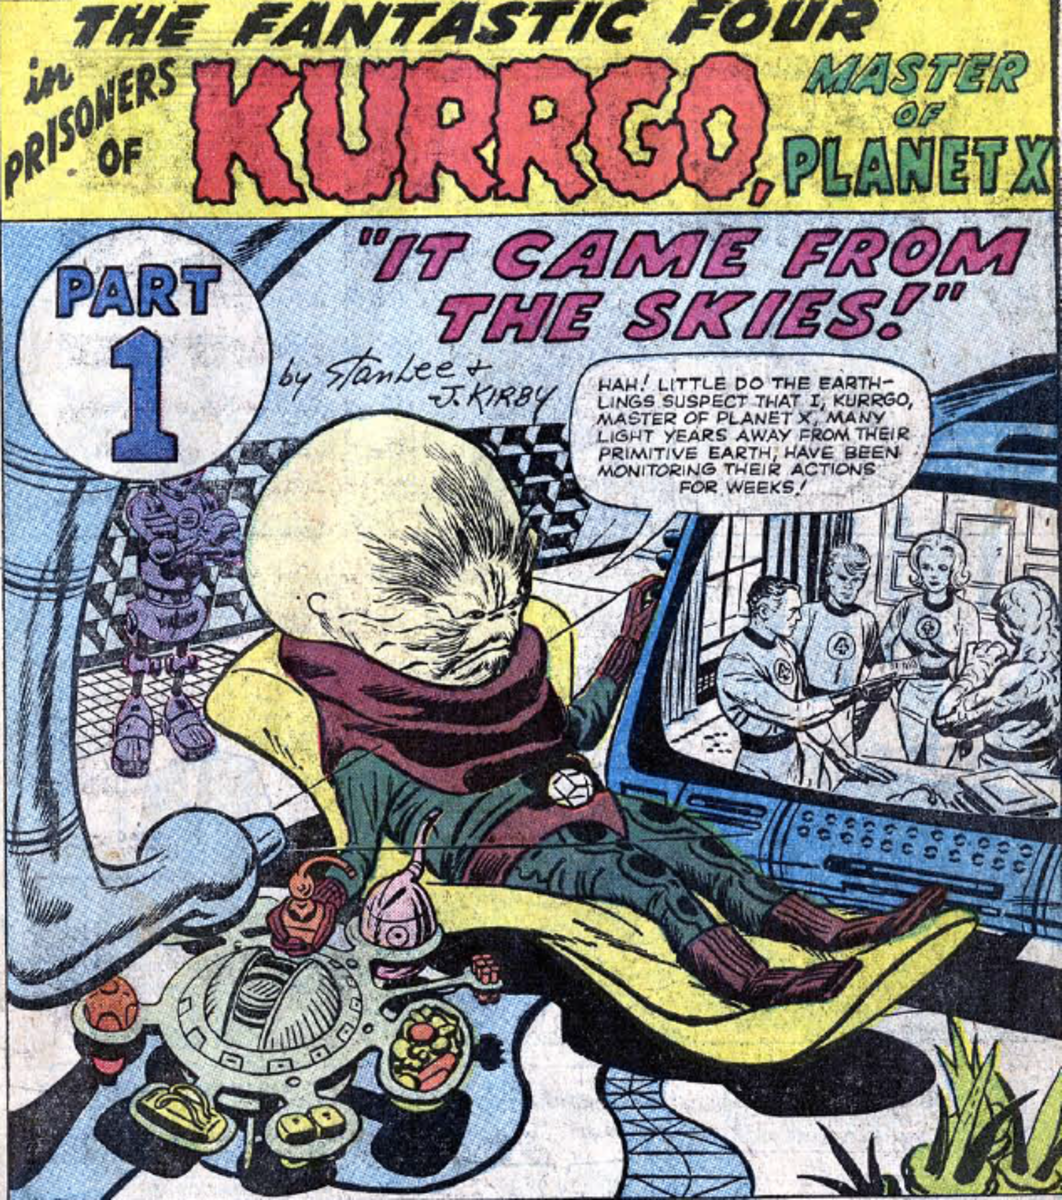 Kurrgo, master of Planet X